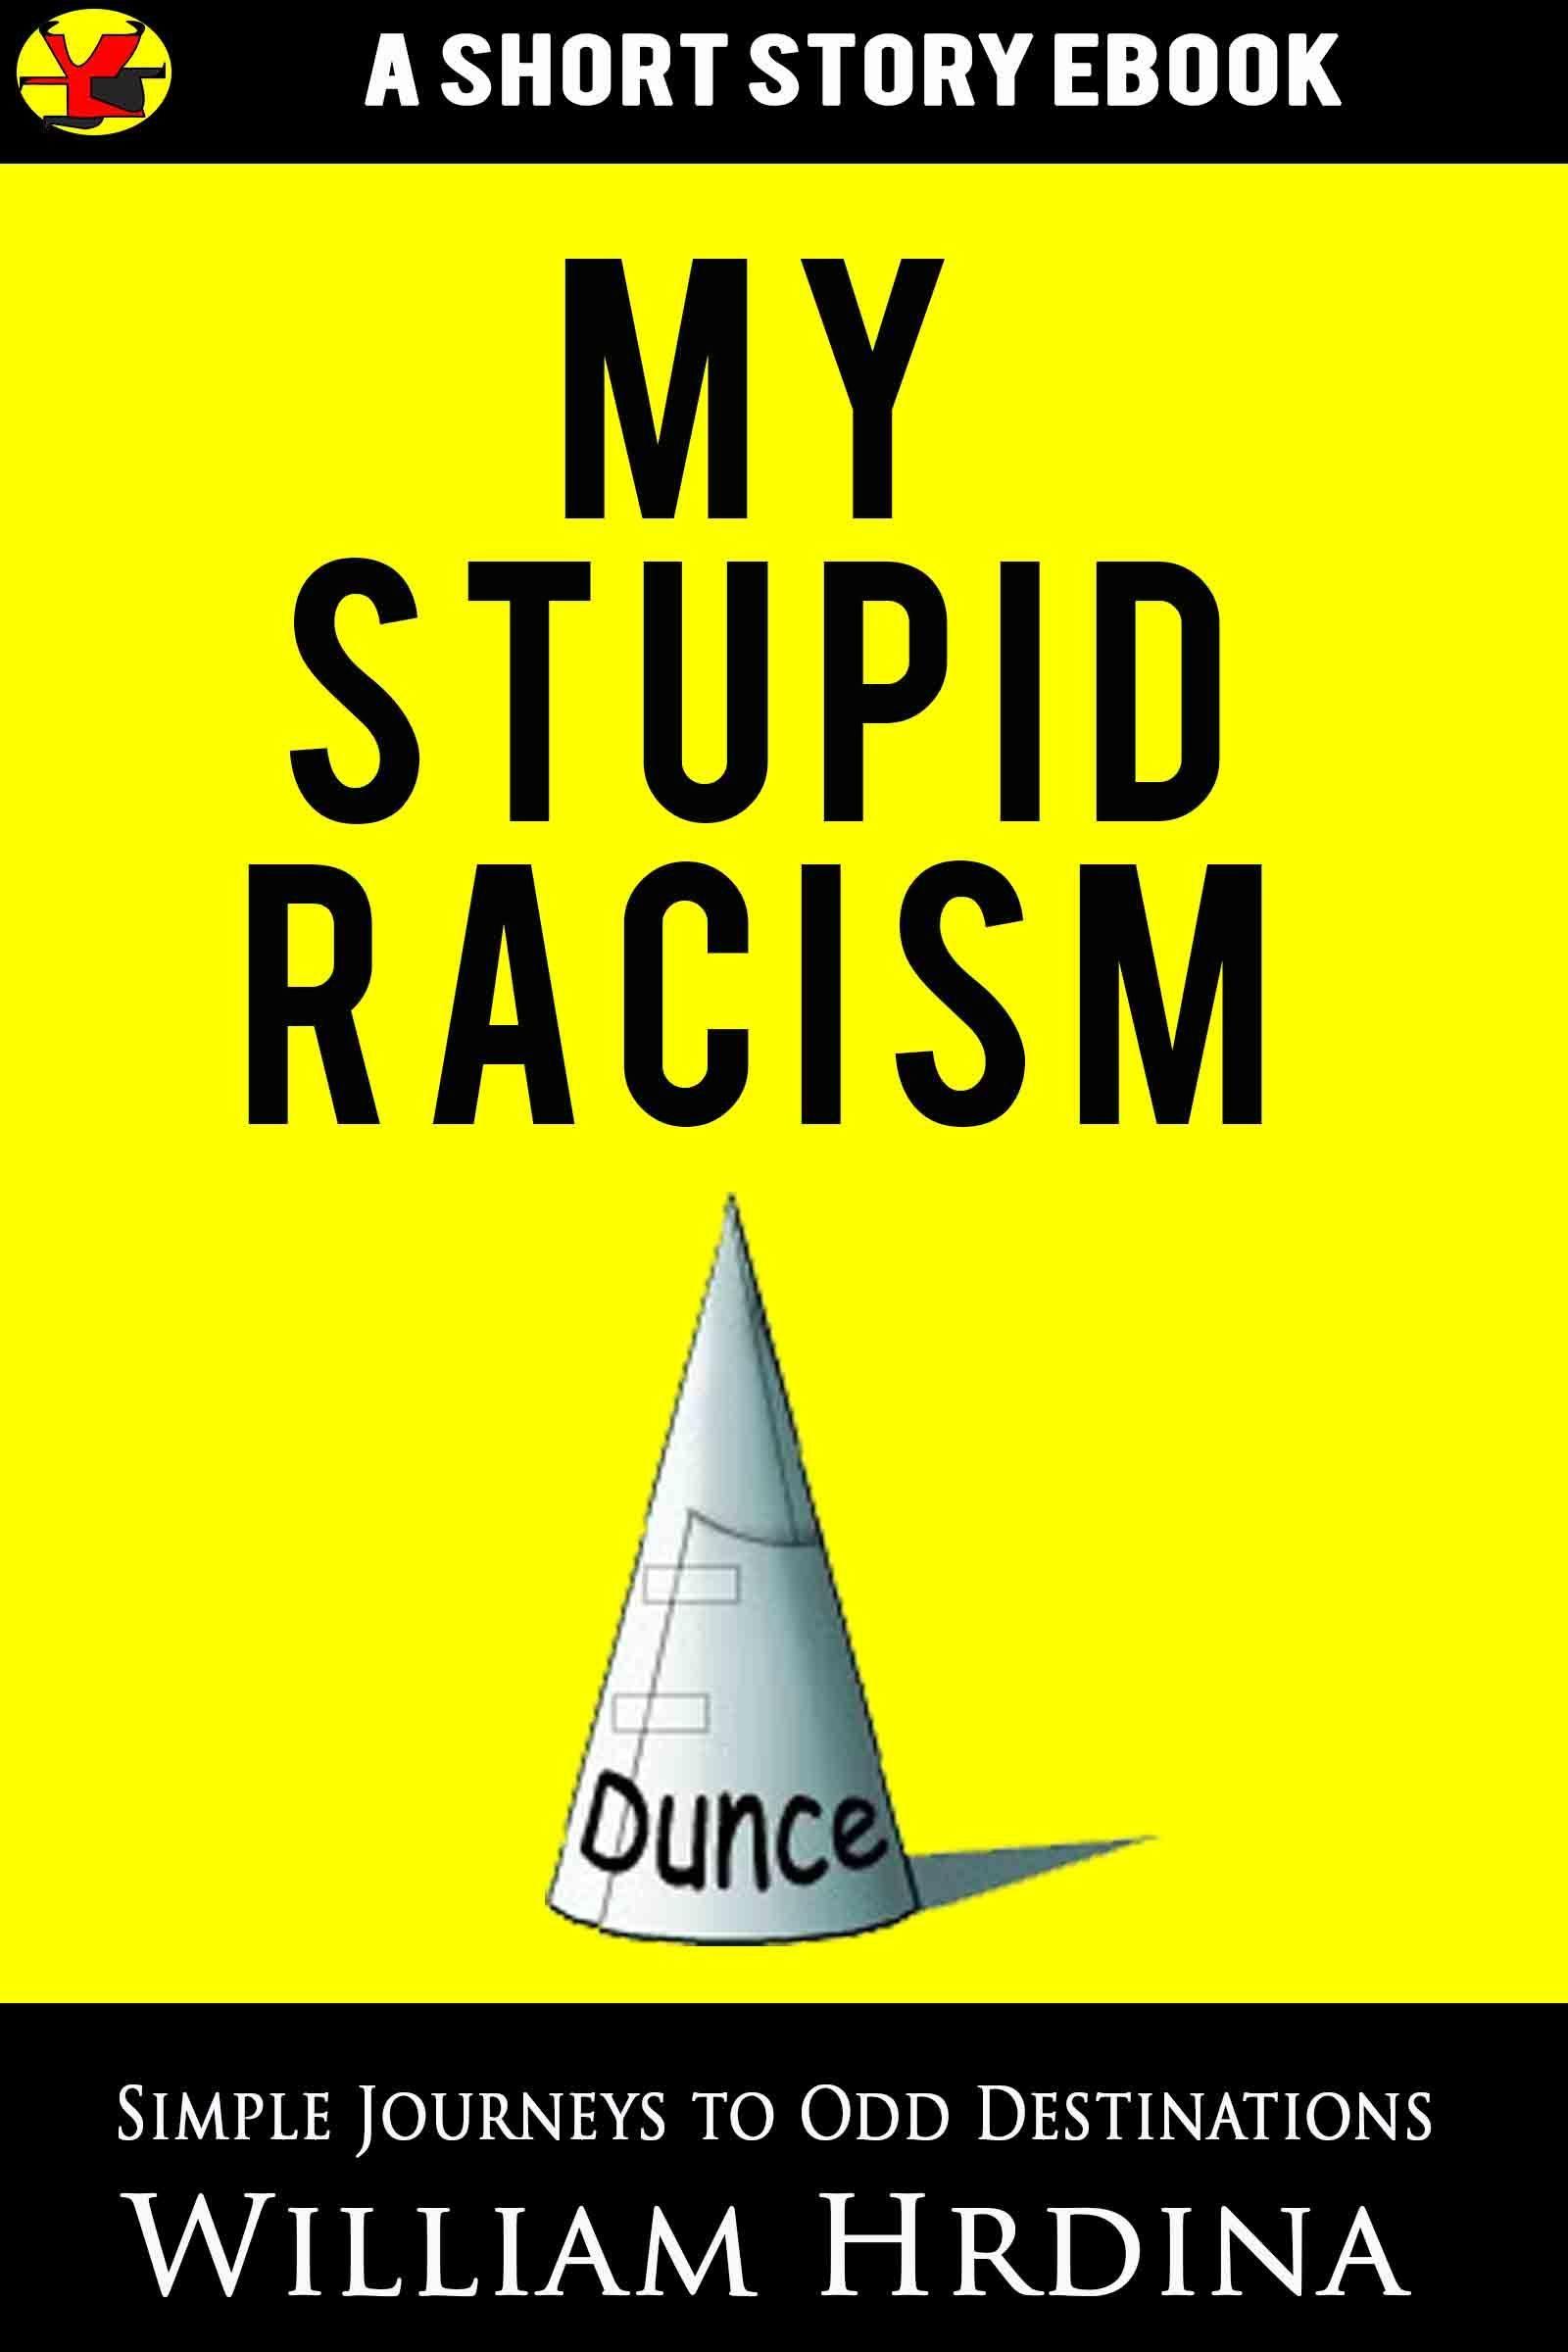 My Stupid Racism William Hrdina